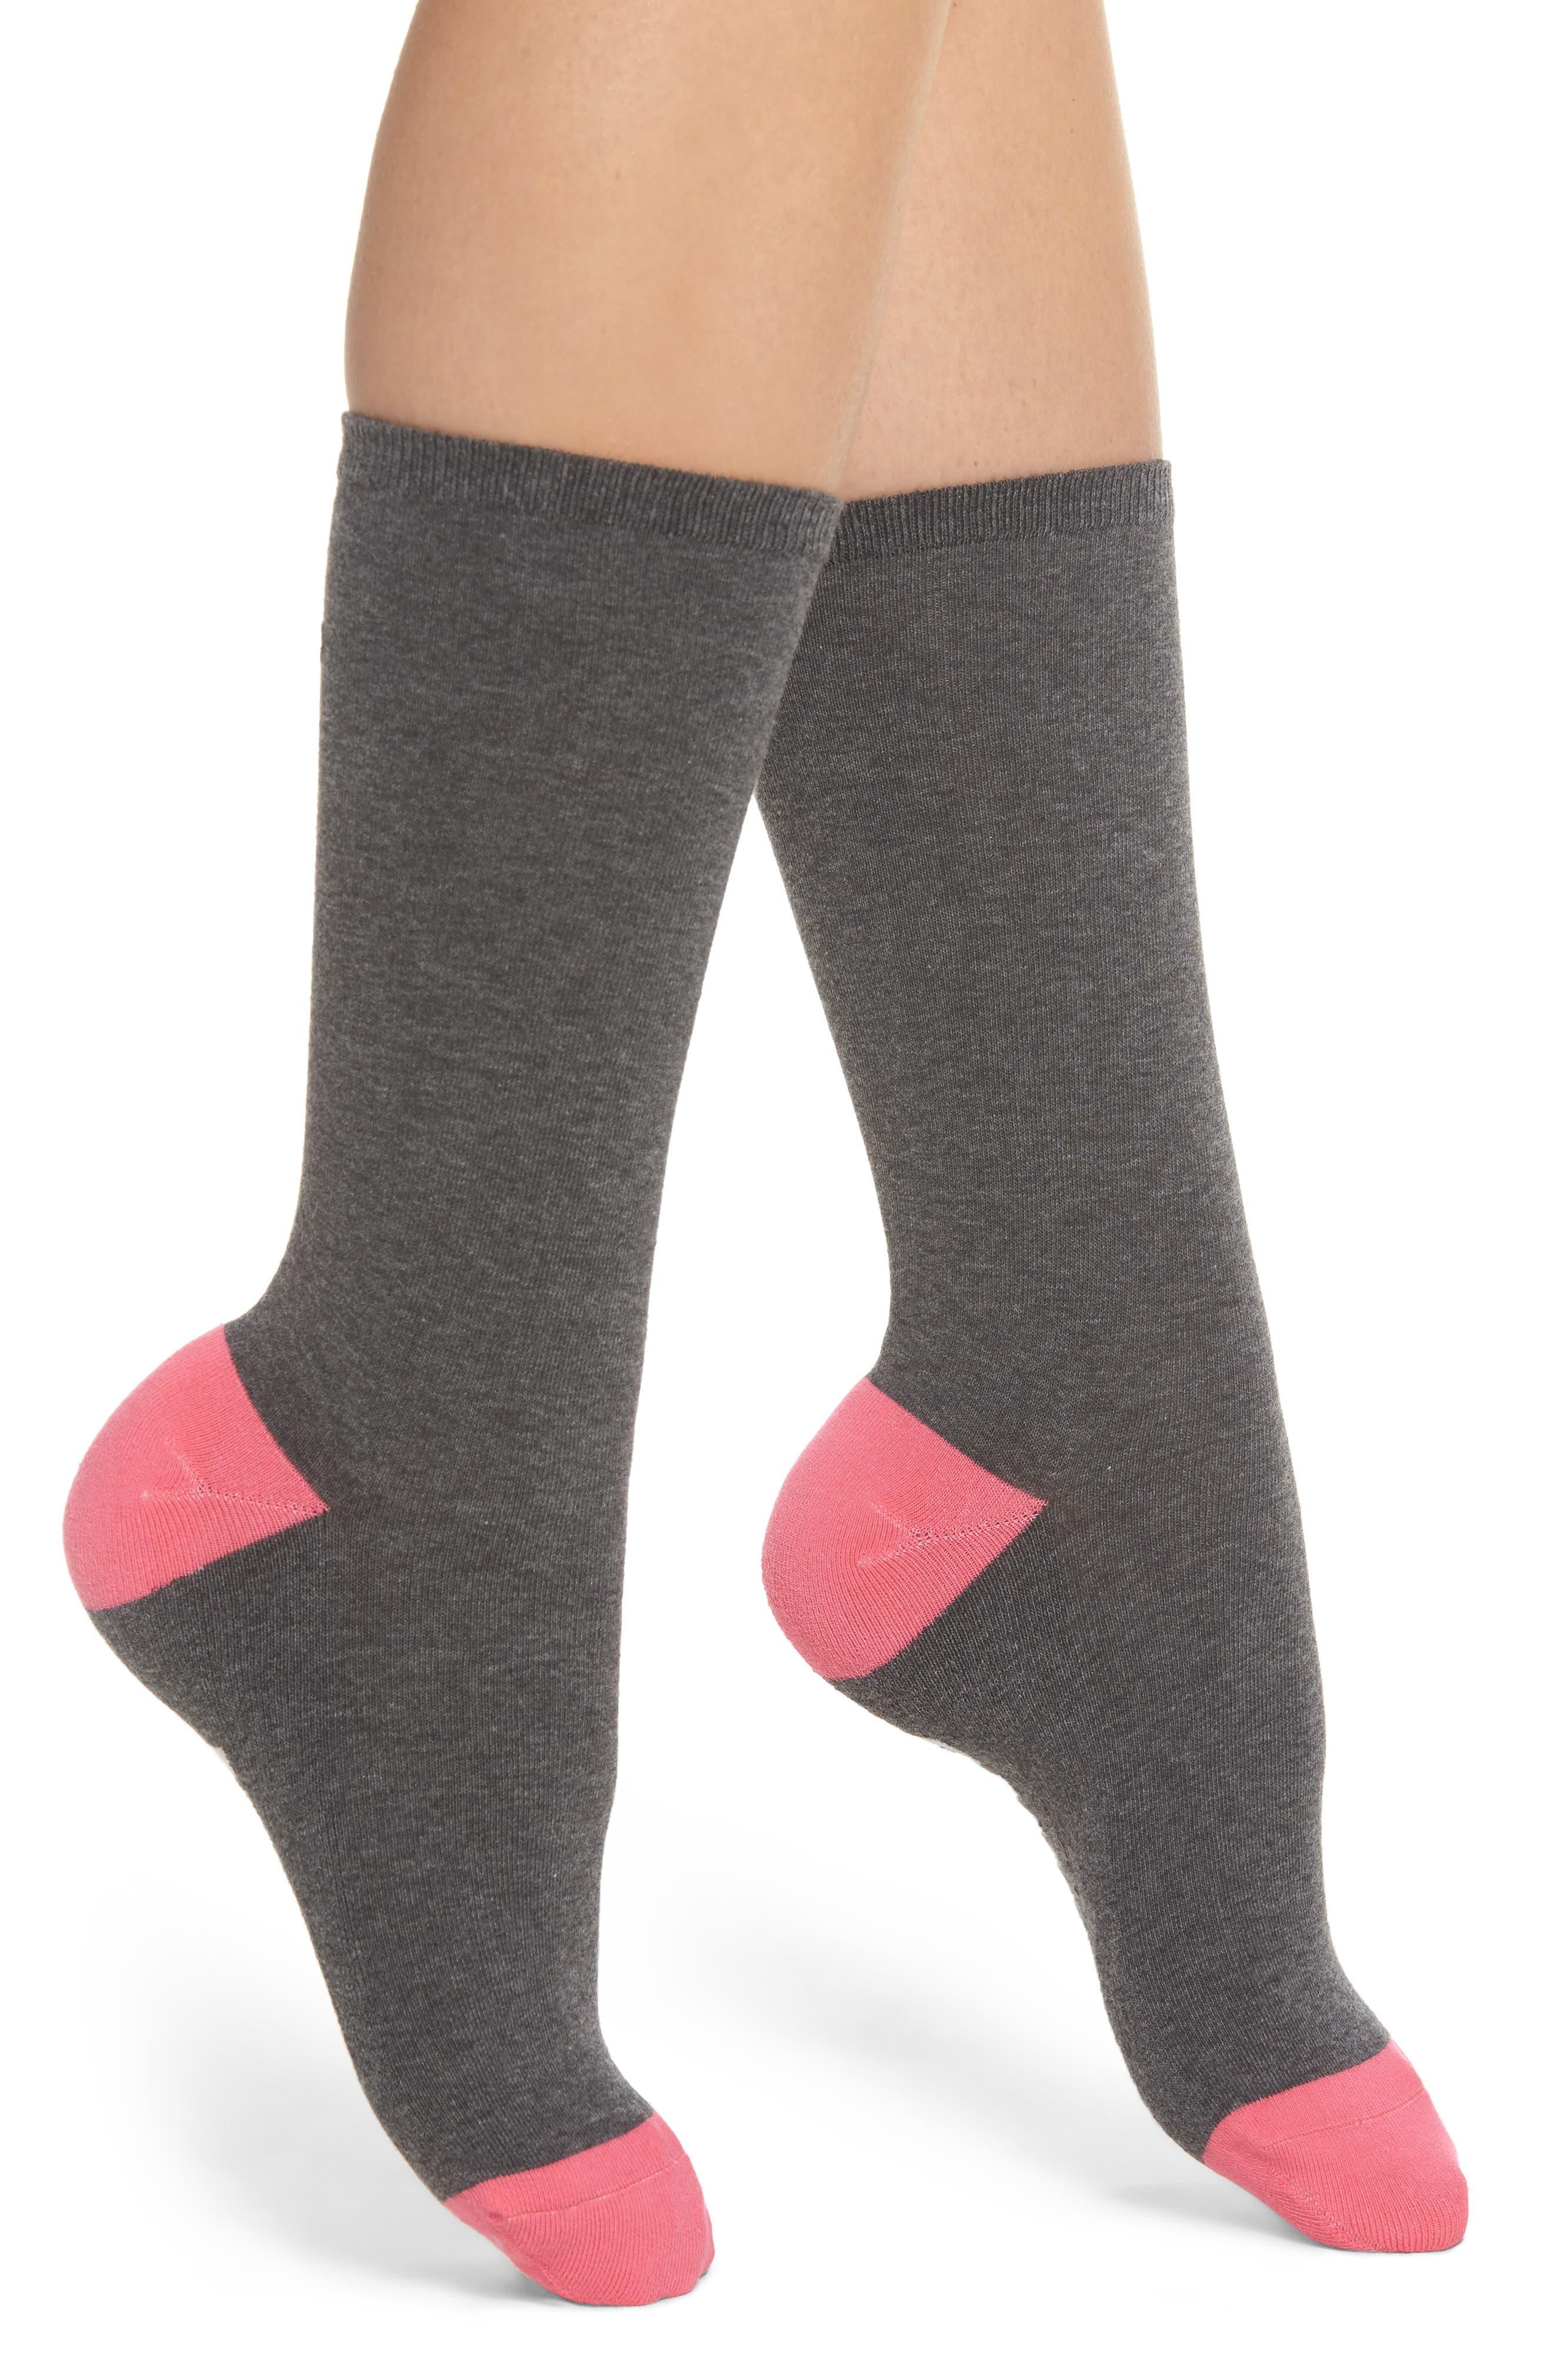 Keep Vibing Crew Socks,                             Alternate thumbnail 2, color,                             Charcoal Heather